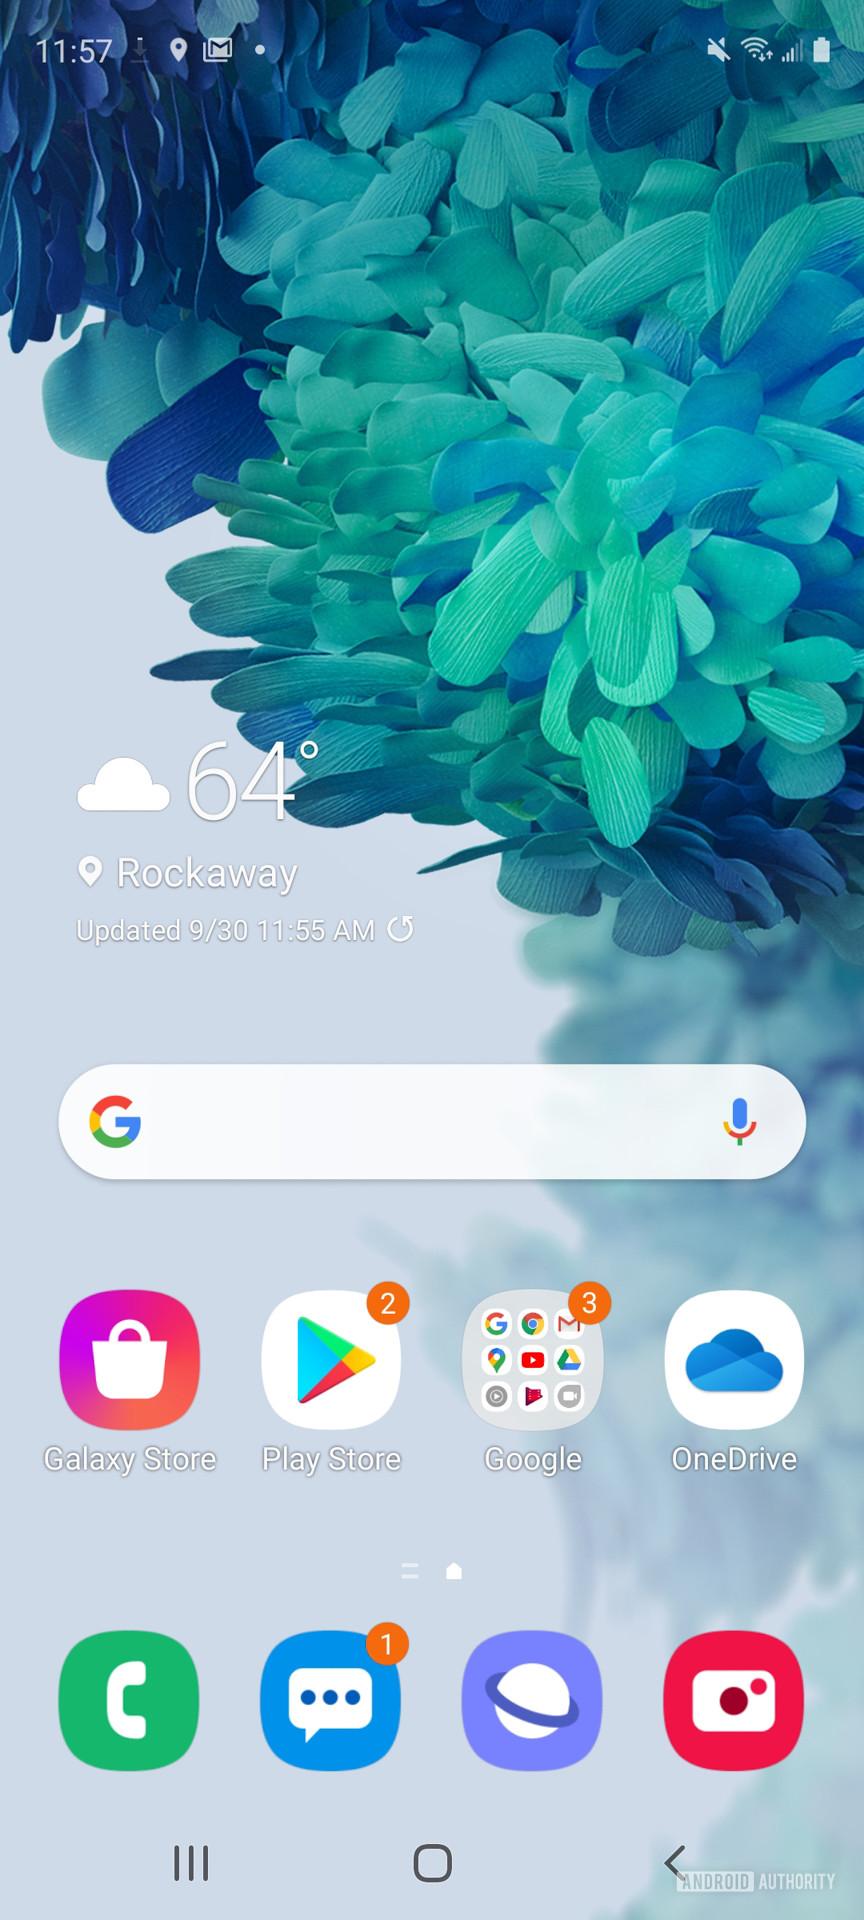 Samsung Galaxy S20 FE home screen